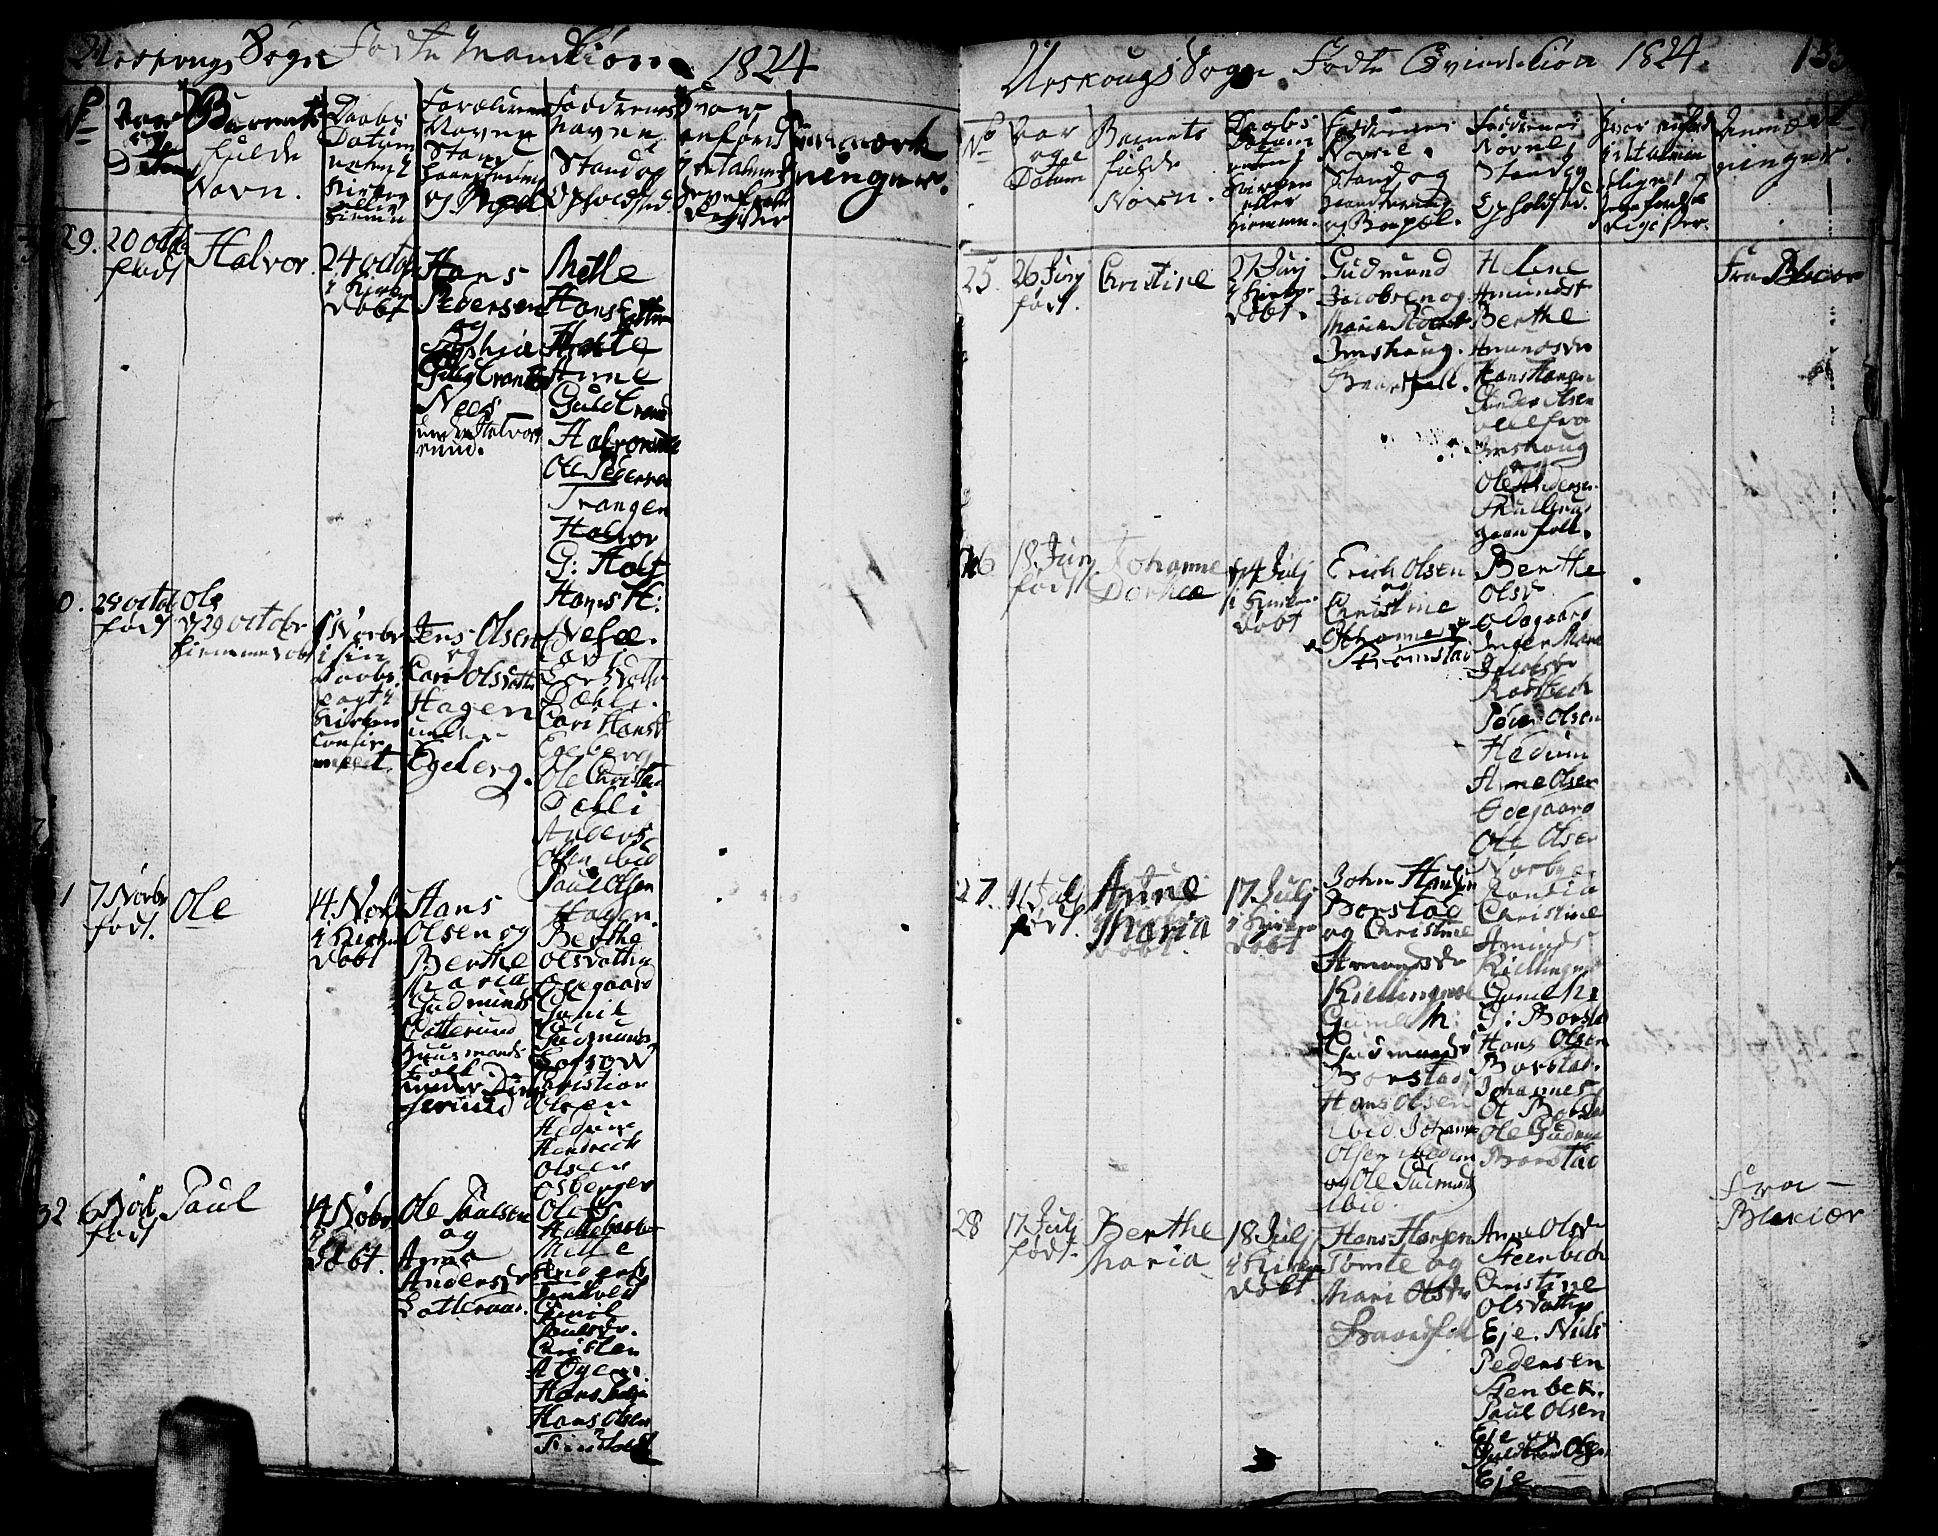 SAO, Aurskog prestekontor Kirkebøker, F/Fa/L0005: Ministerialbok nr. I 5, 1814-1829, s. 133